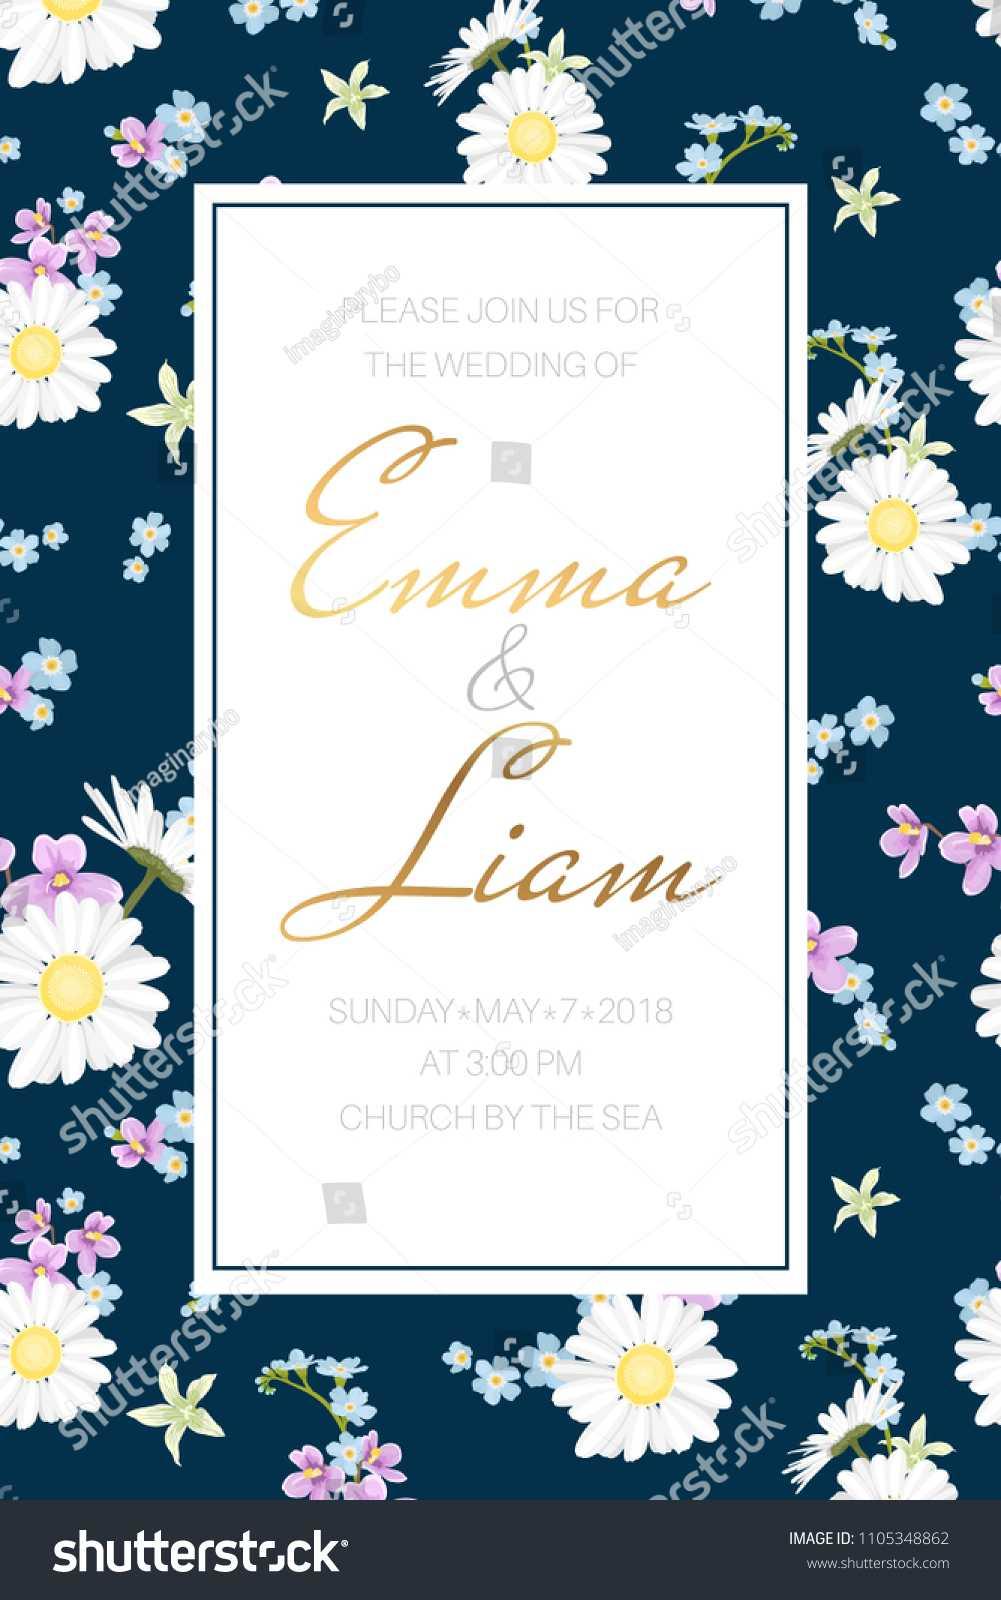 Wedding Marriage Event Invitation Card Template Stock Vector Regarding Event Invitation Card Template